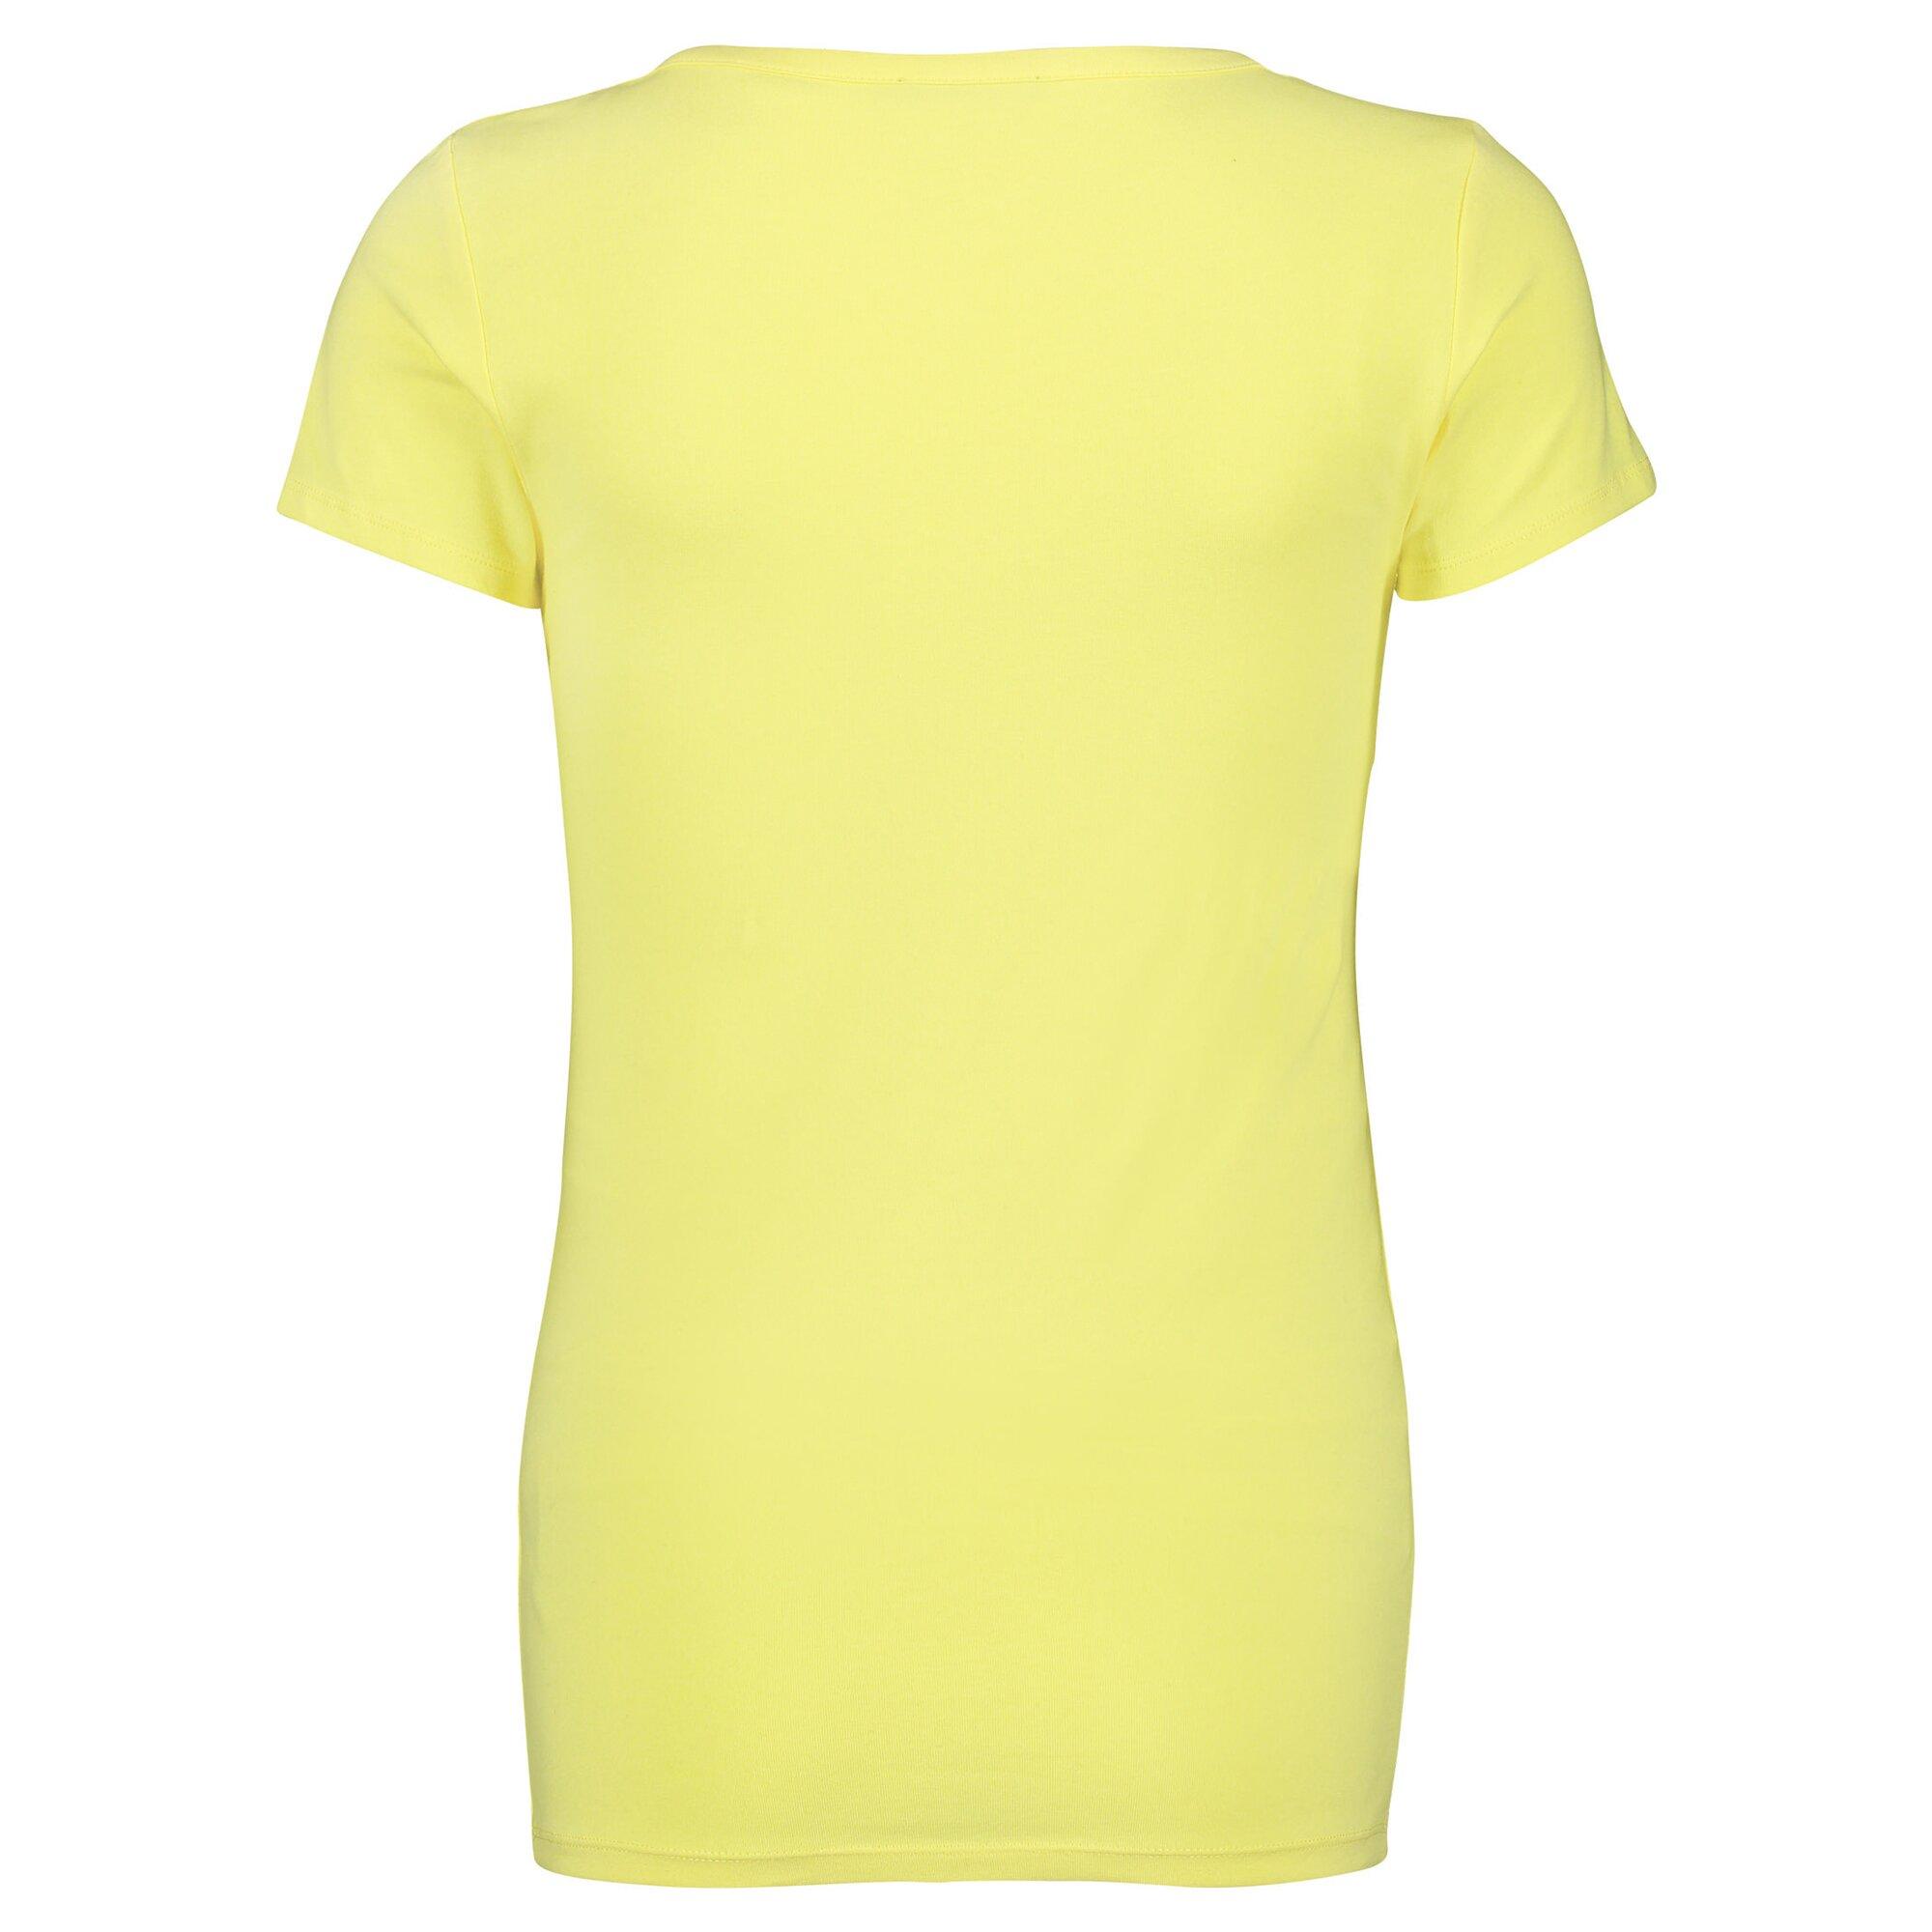 supermom-t-shirt-text